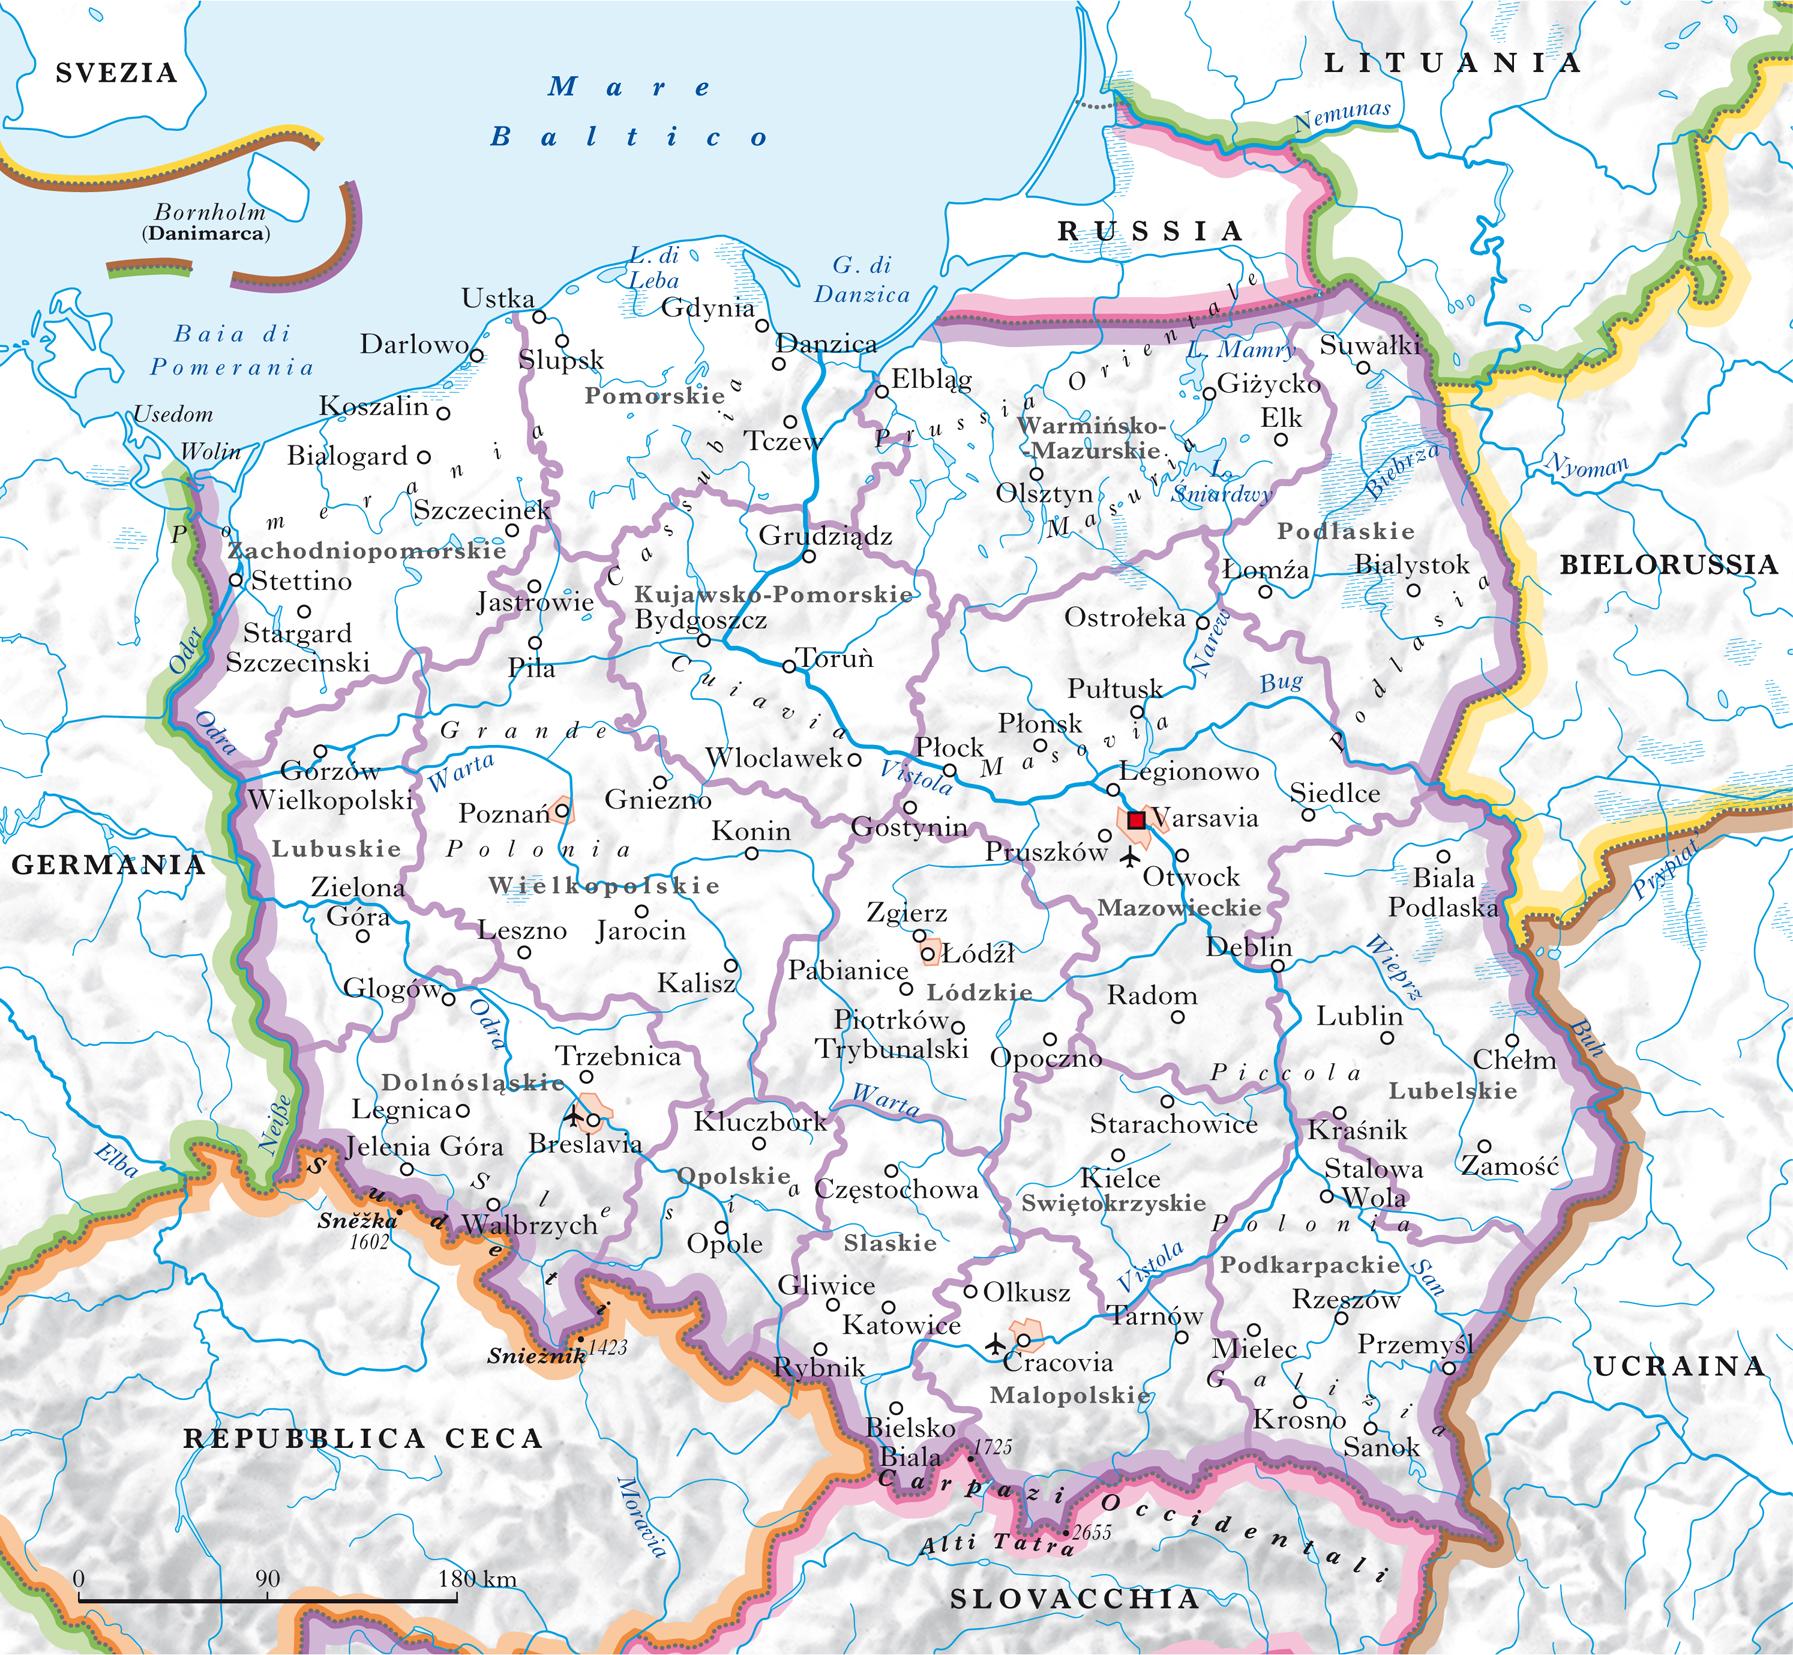 Cartina Elba Fiume.Polonia Nell Enciclopedia Treccani